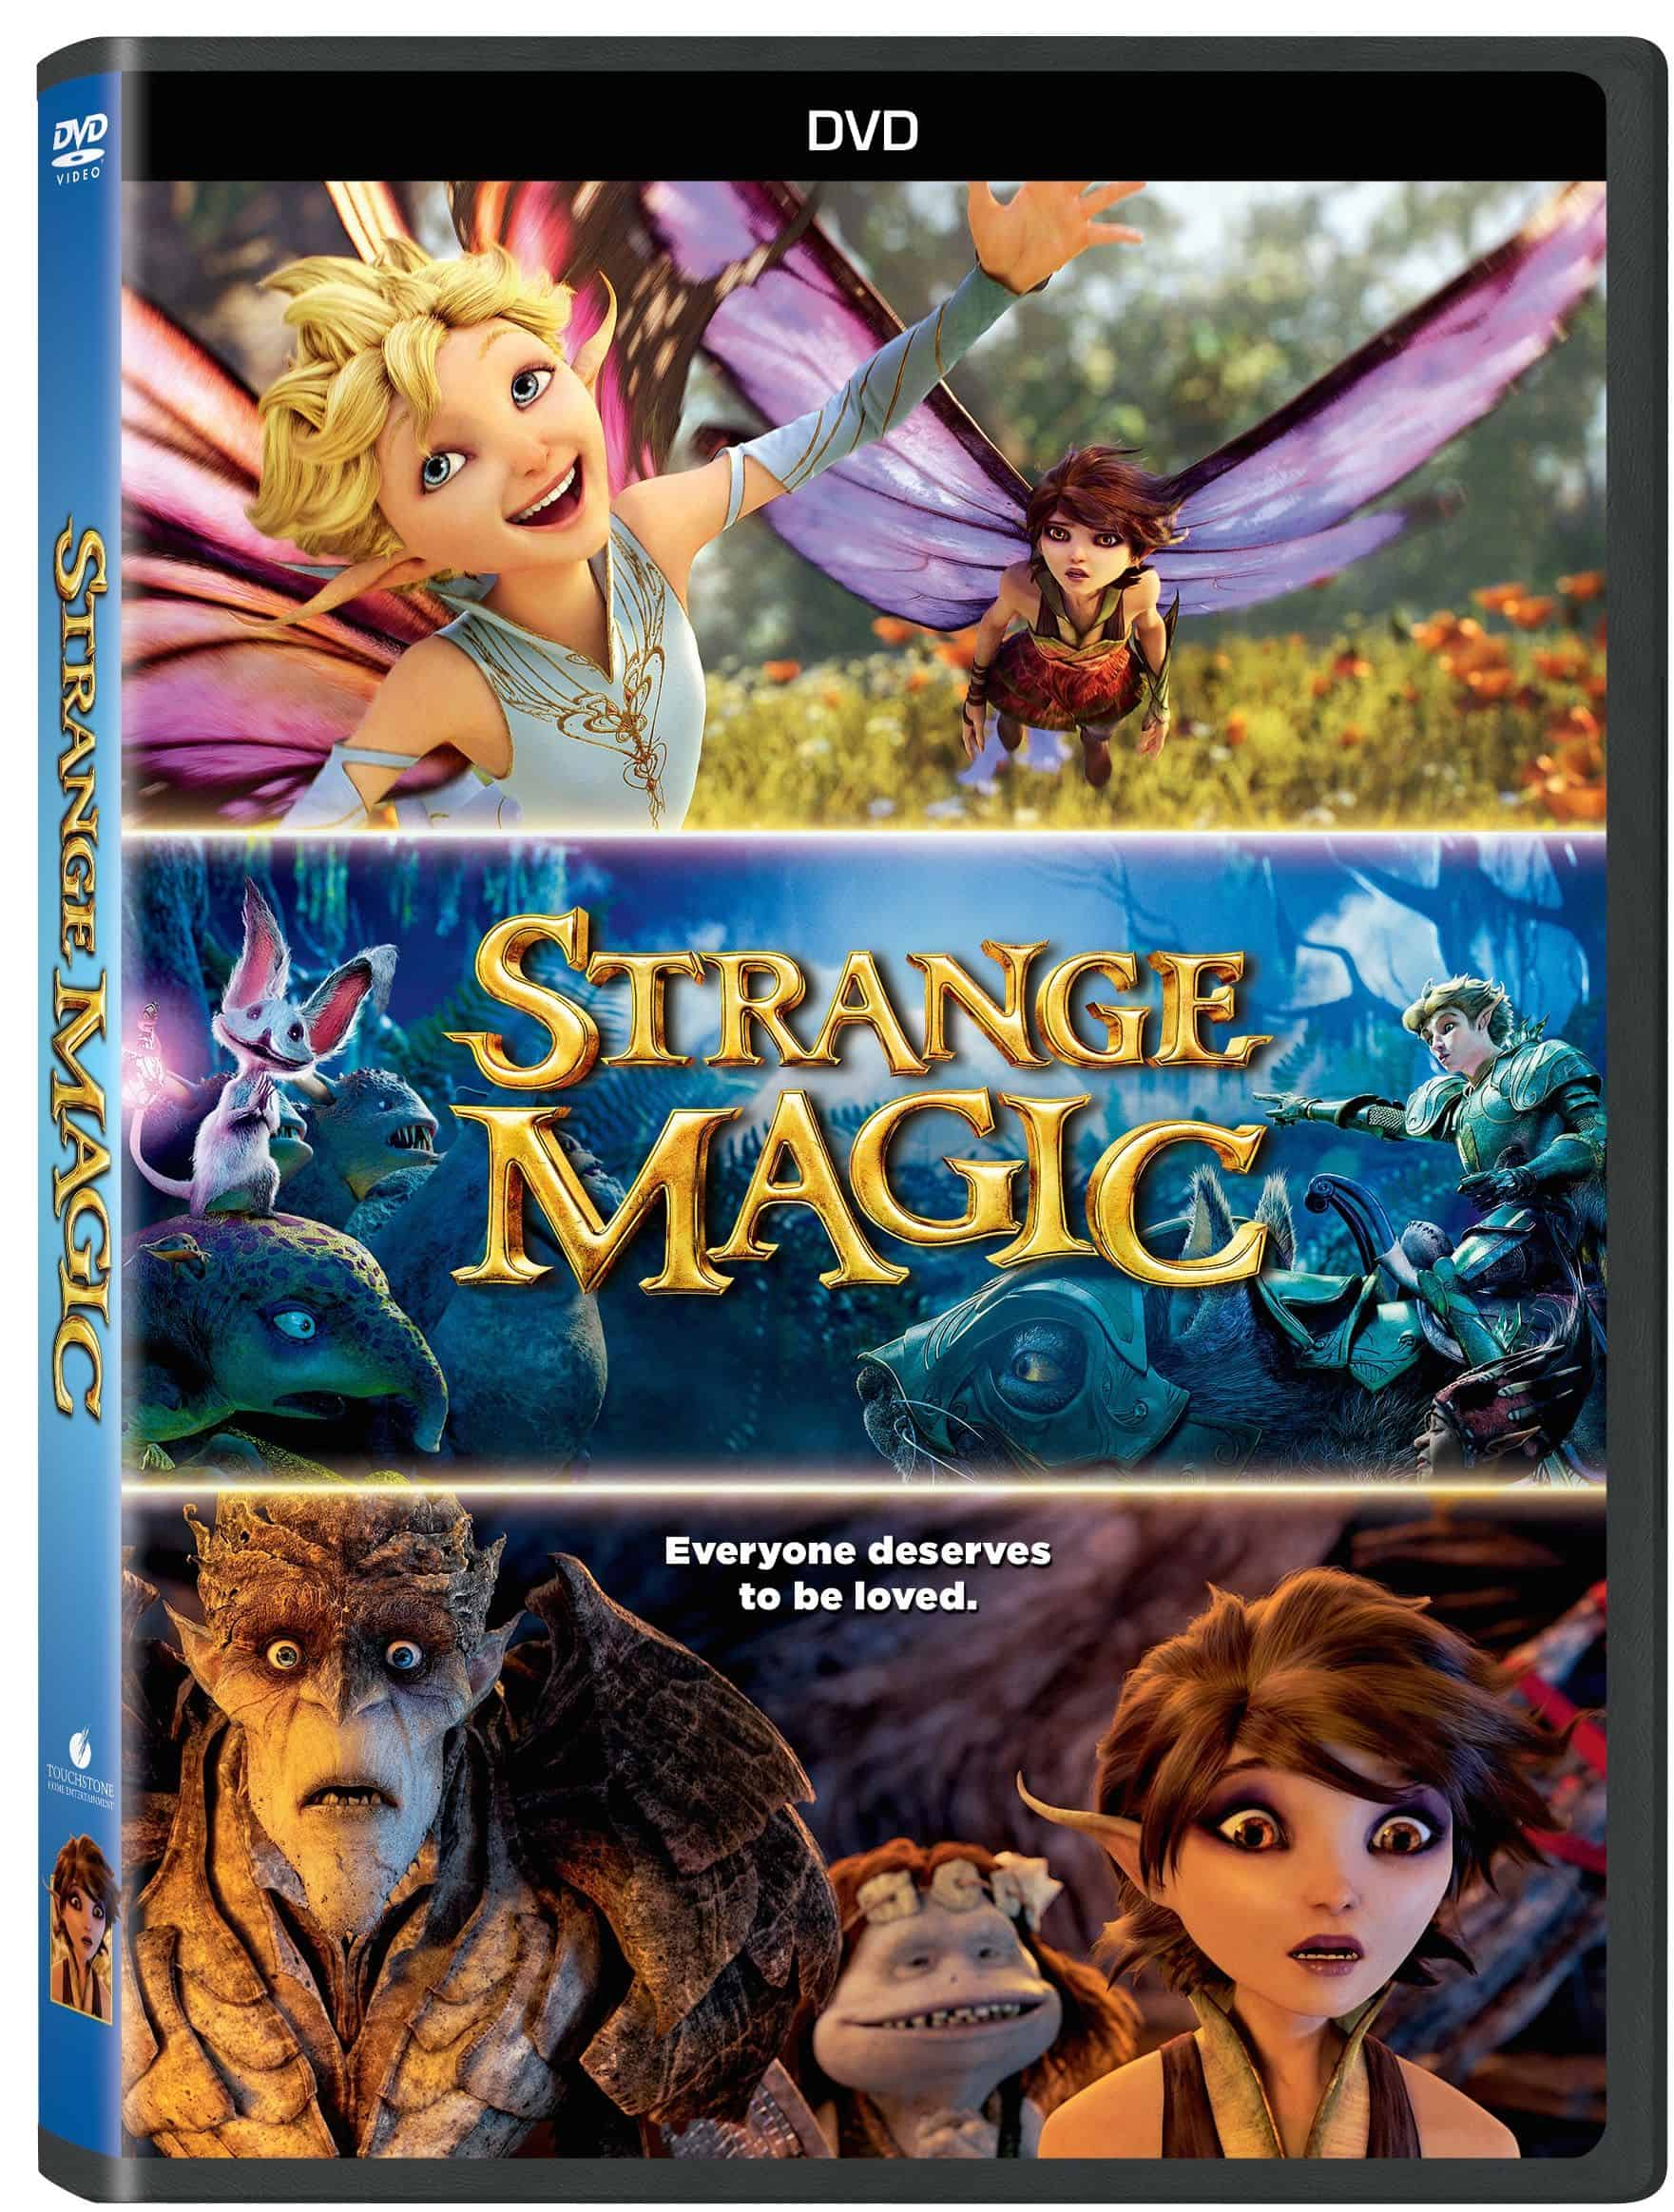 StrangeMagicDVD copy (1)